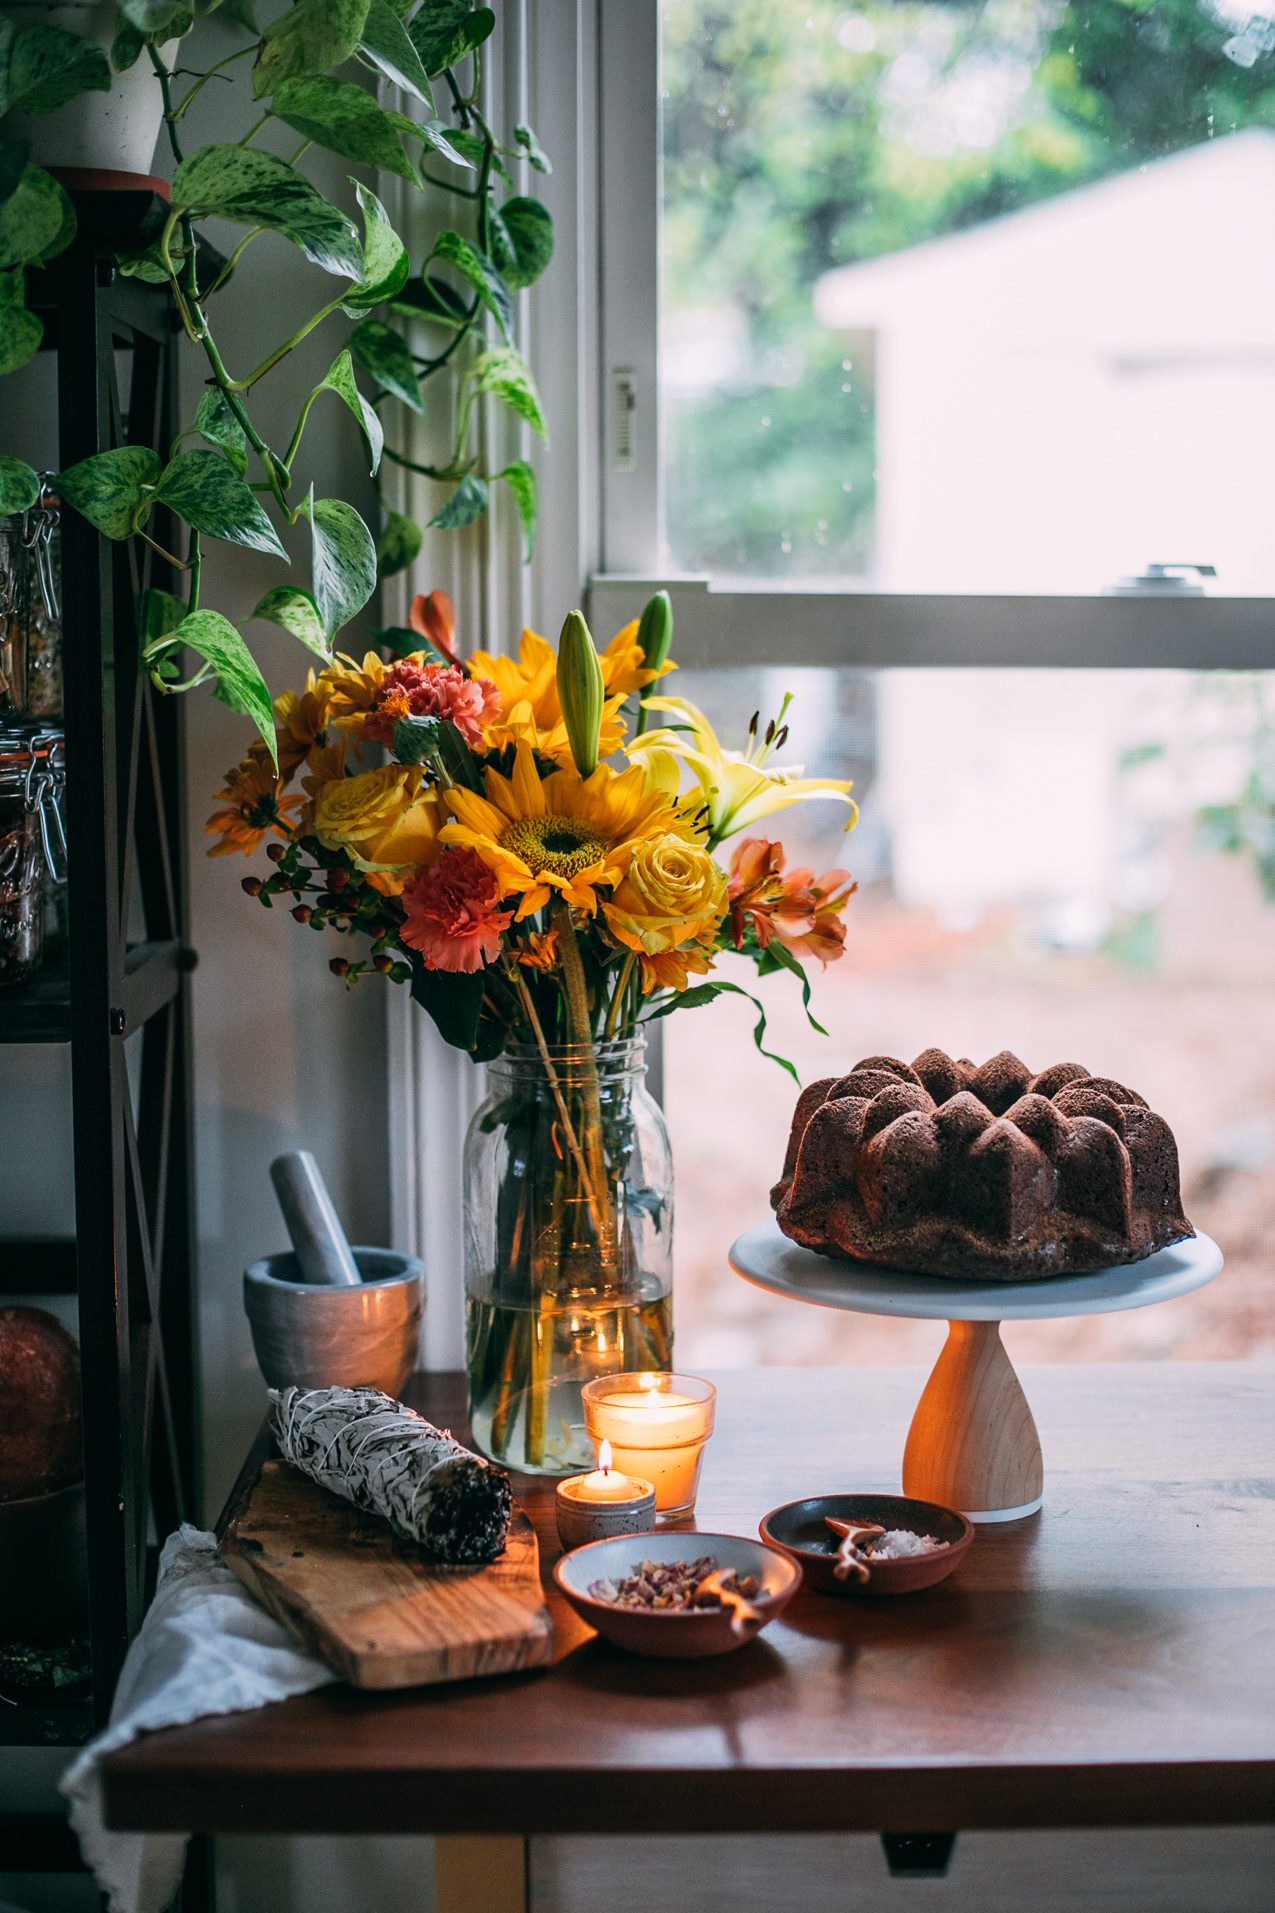 mrh-chocolate-cake-4930.jpg